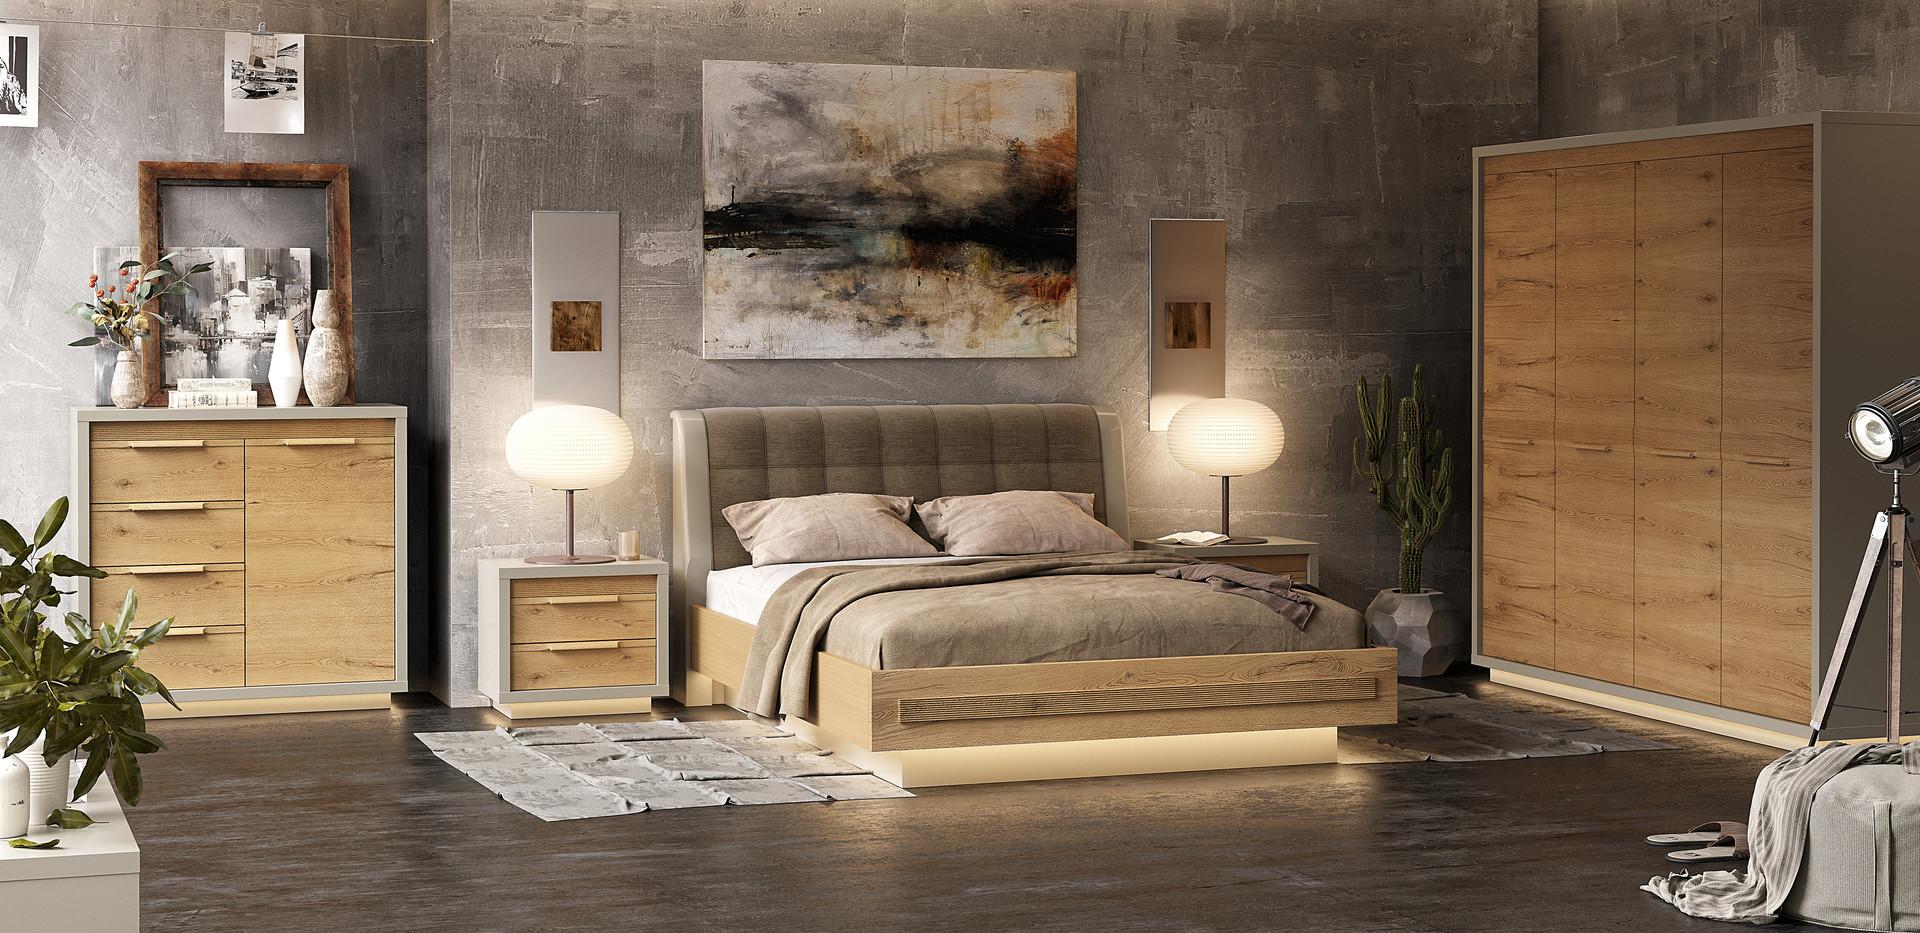 Bedroom_01.jpg